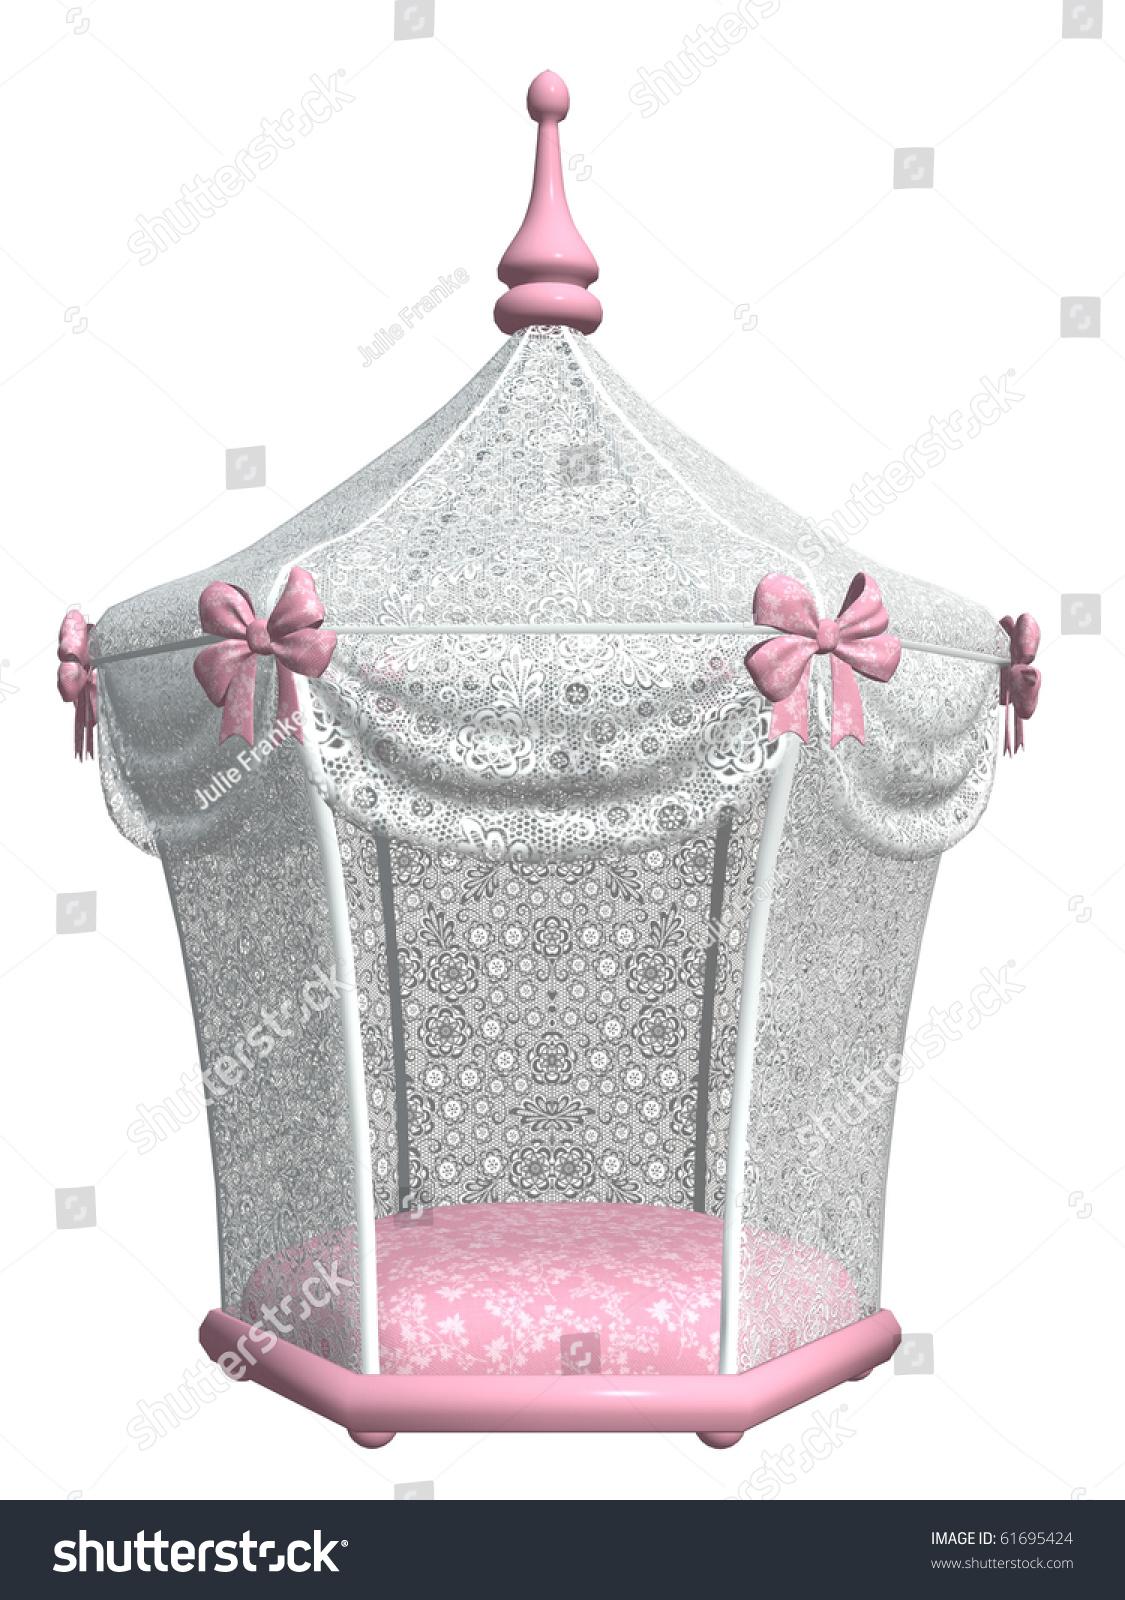 cute pink cat canopy bed  sc 1 st  Shutterstock & Cute Pink Cat Canopy Bed Stock Illustration 61695424 - Shutterstock